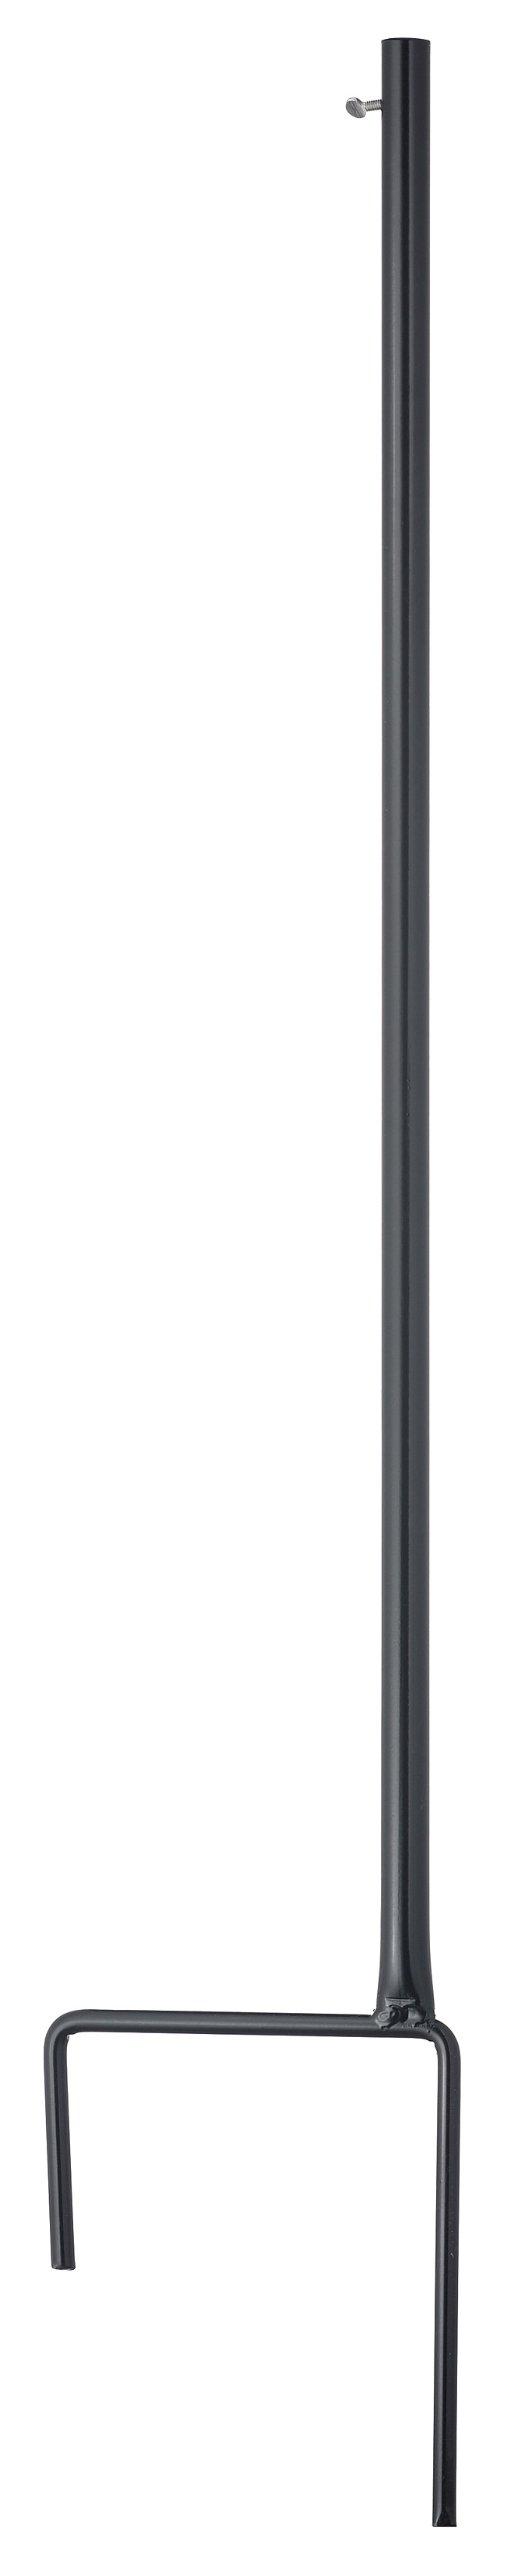 Good Directions 403R Full Size Weathervane, Garden Pole